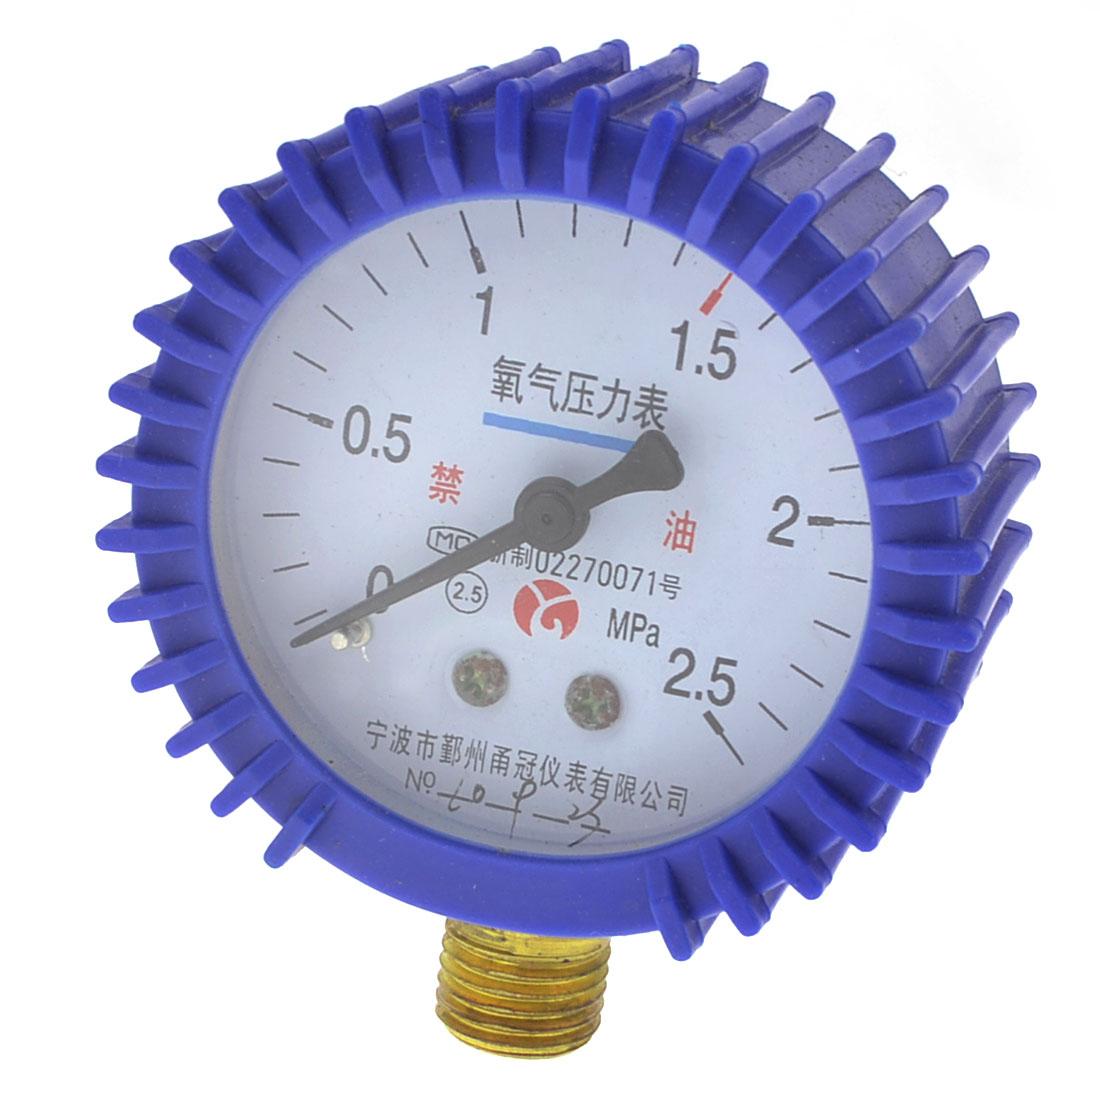 Round Dial 0.5 Accuracy Air Compressor Pressure Gauge 0-2.5MPa